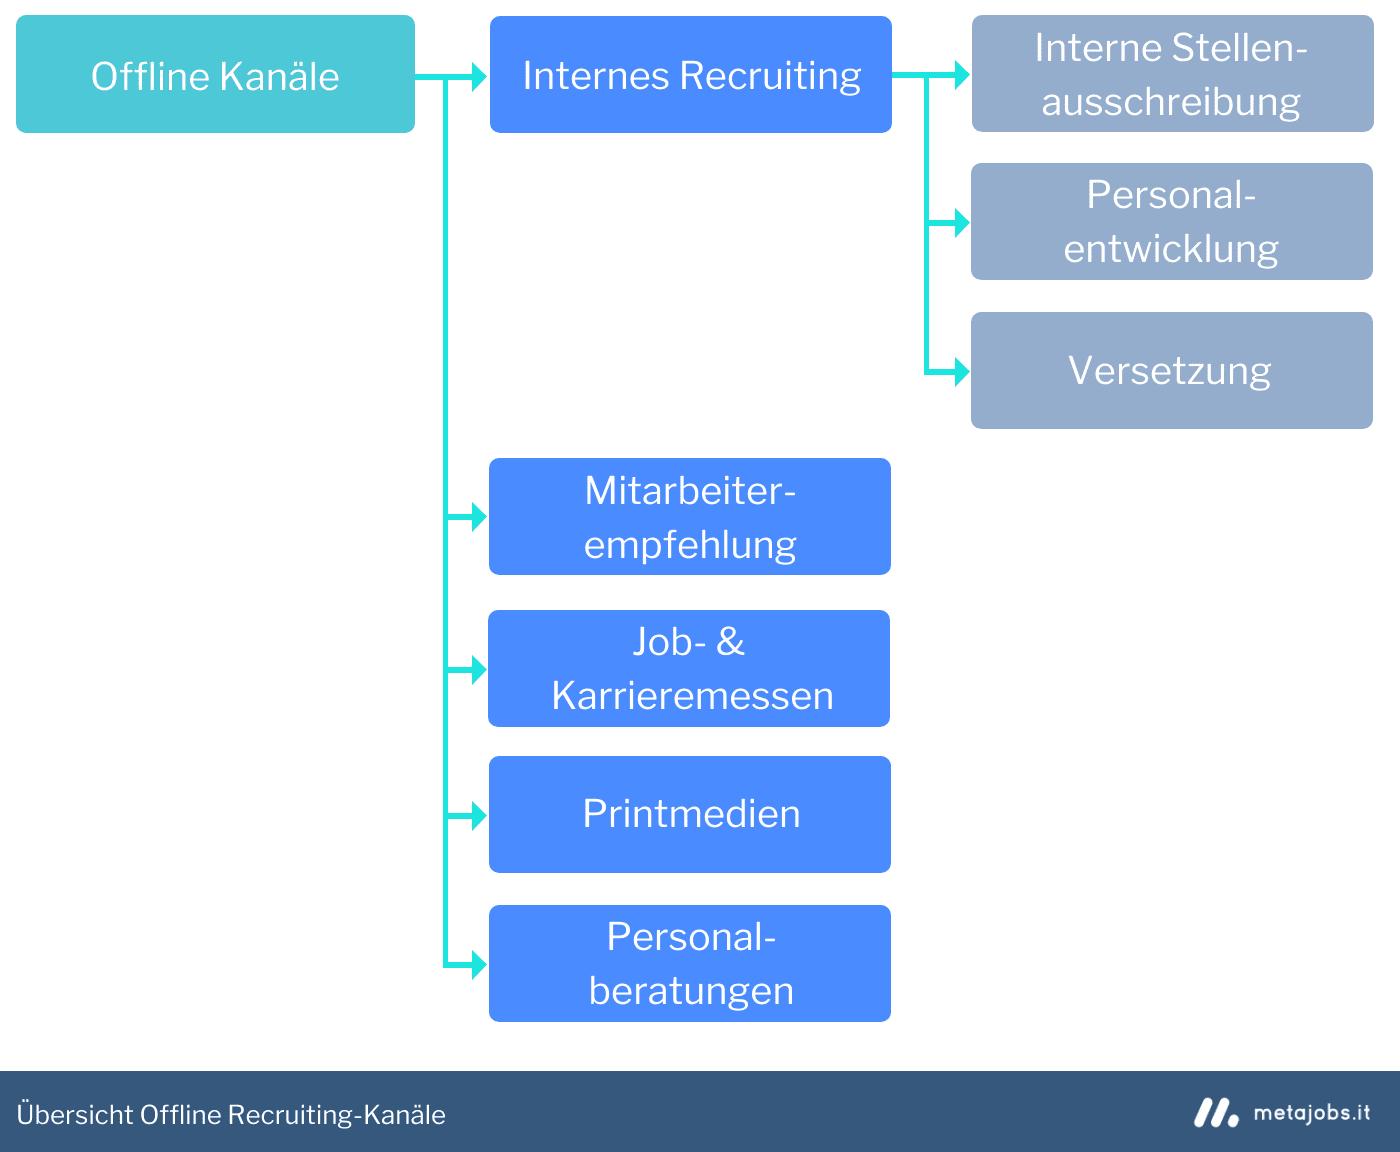 Offline Recruiting-Kanäle im Überblick Infografik